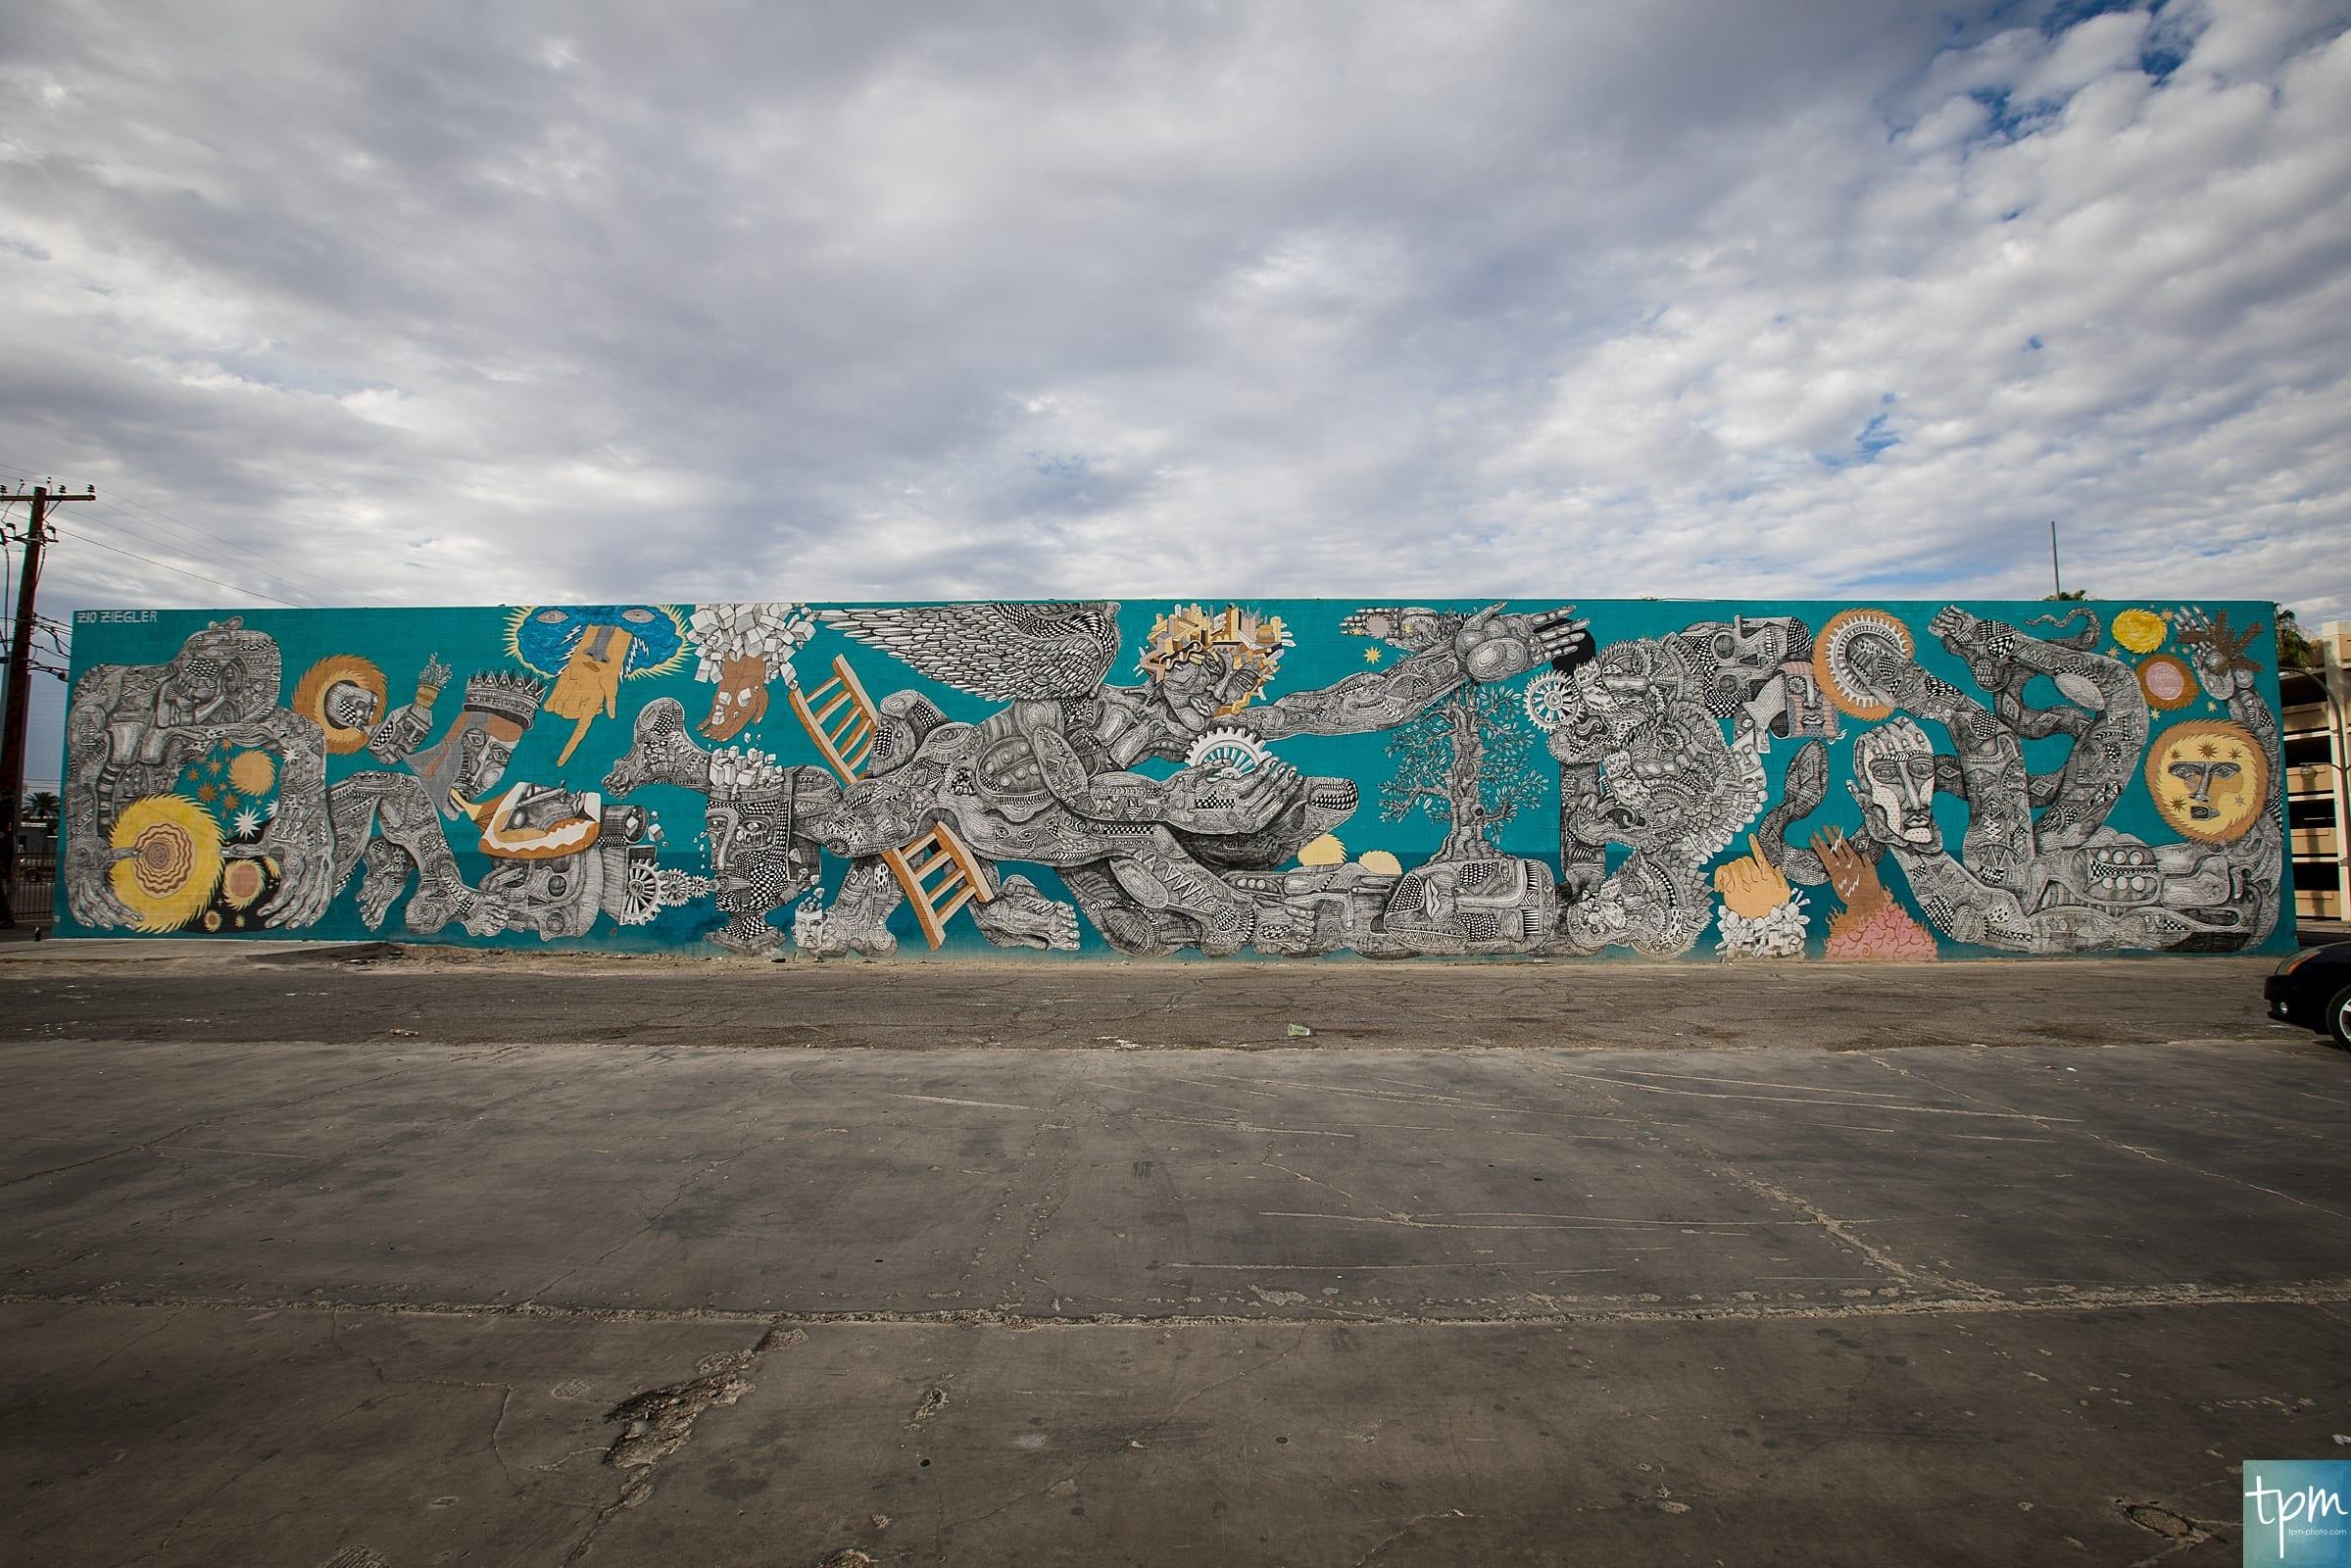 Zio Ziegler, Cycle of Civilization, 7th Street, Taylored Photo Memories, Las Vegas Murals